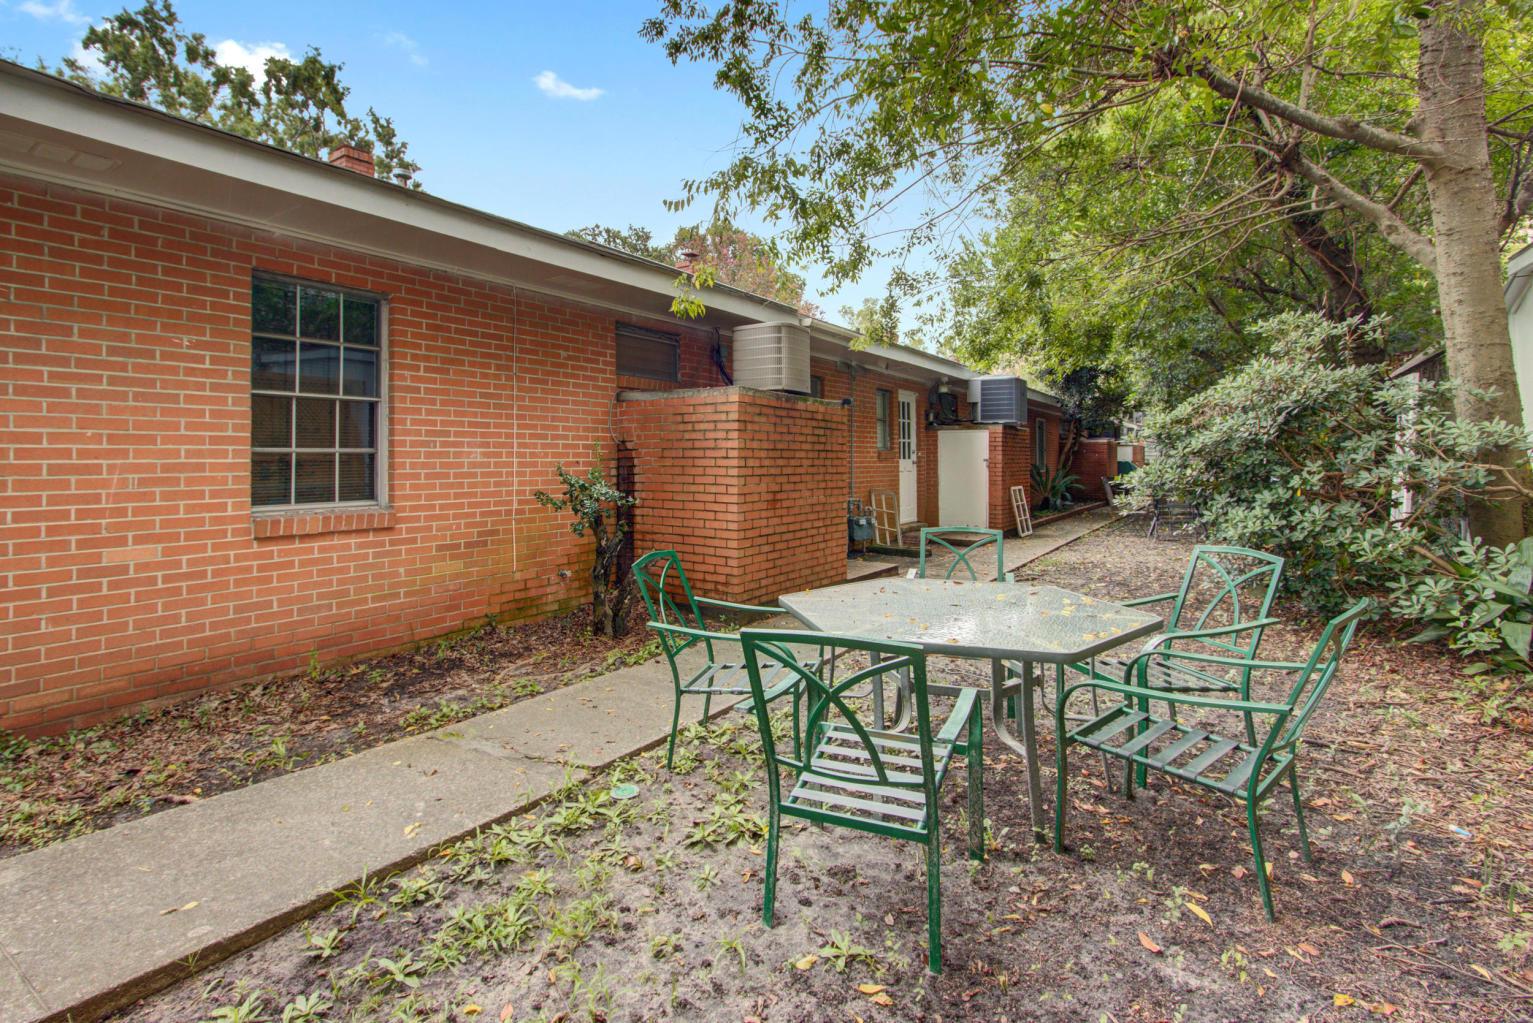 Rutledge Green Homes For Sale - 173 Rutledge, Charleston, SC - 1